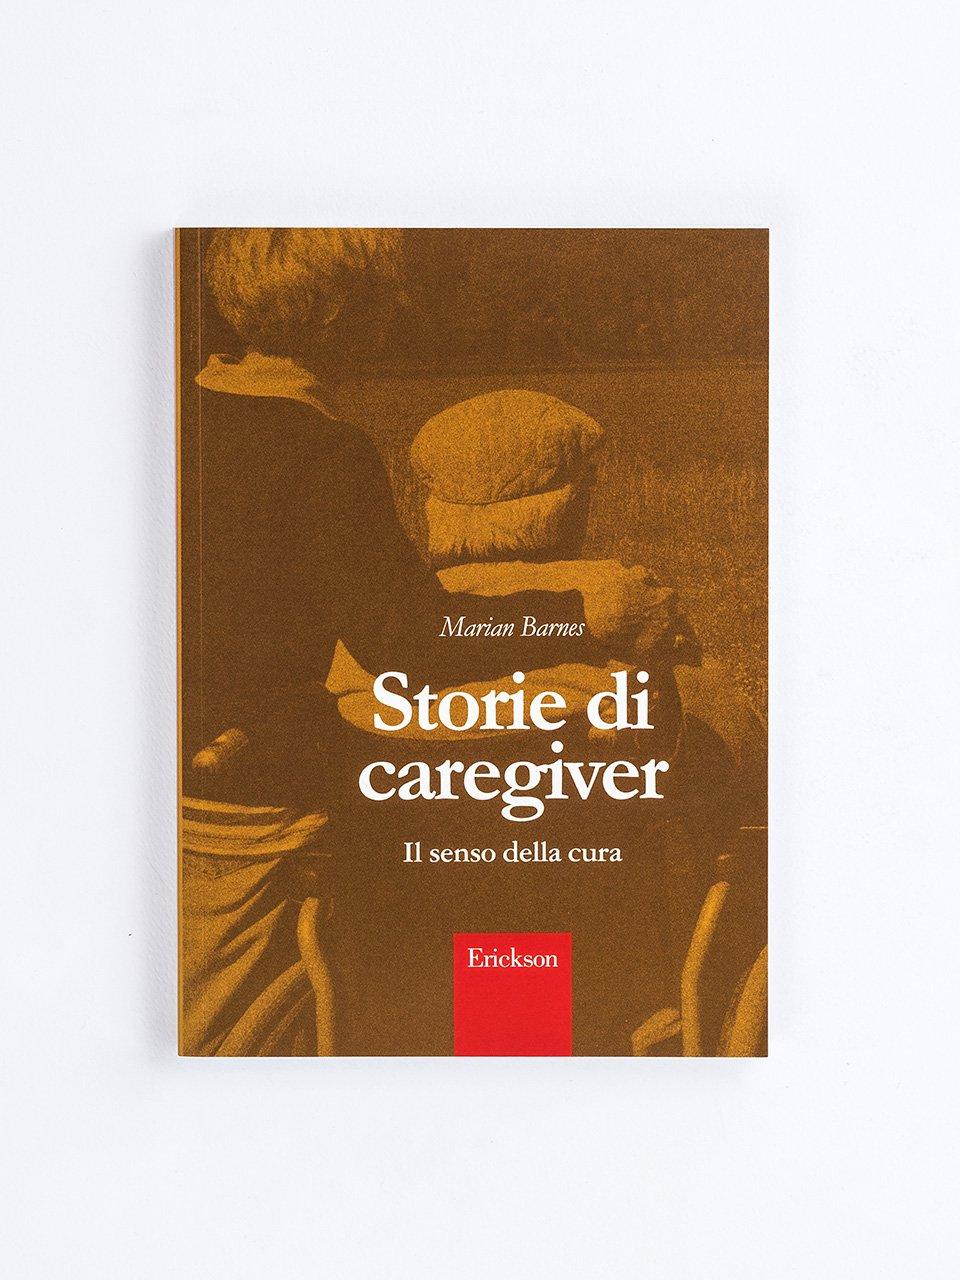 Storie di caregiver - Una badante in famiglia - Libri - Erickson